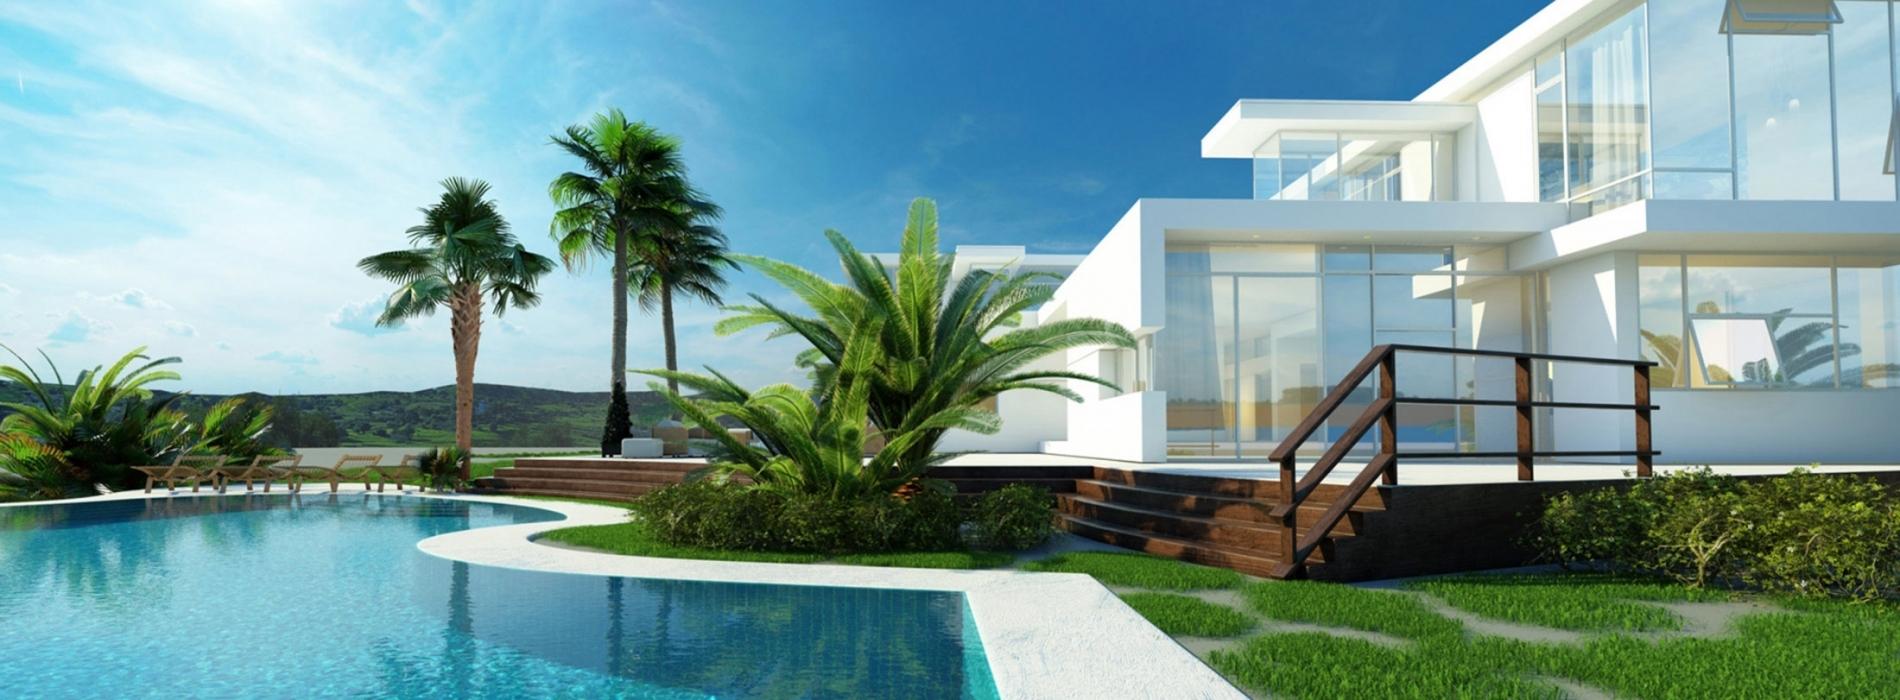 Immobilier biarritz burban immobilier location de - Location maison piscine biarritz ...